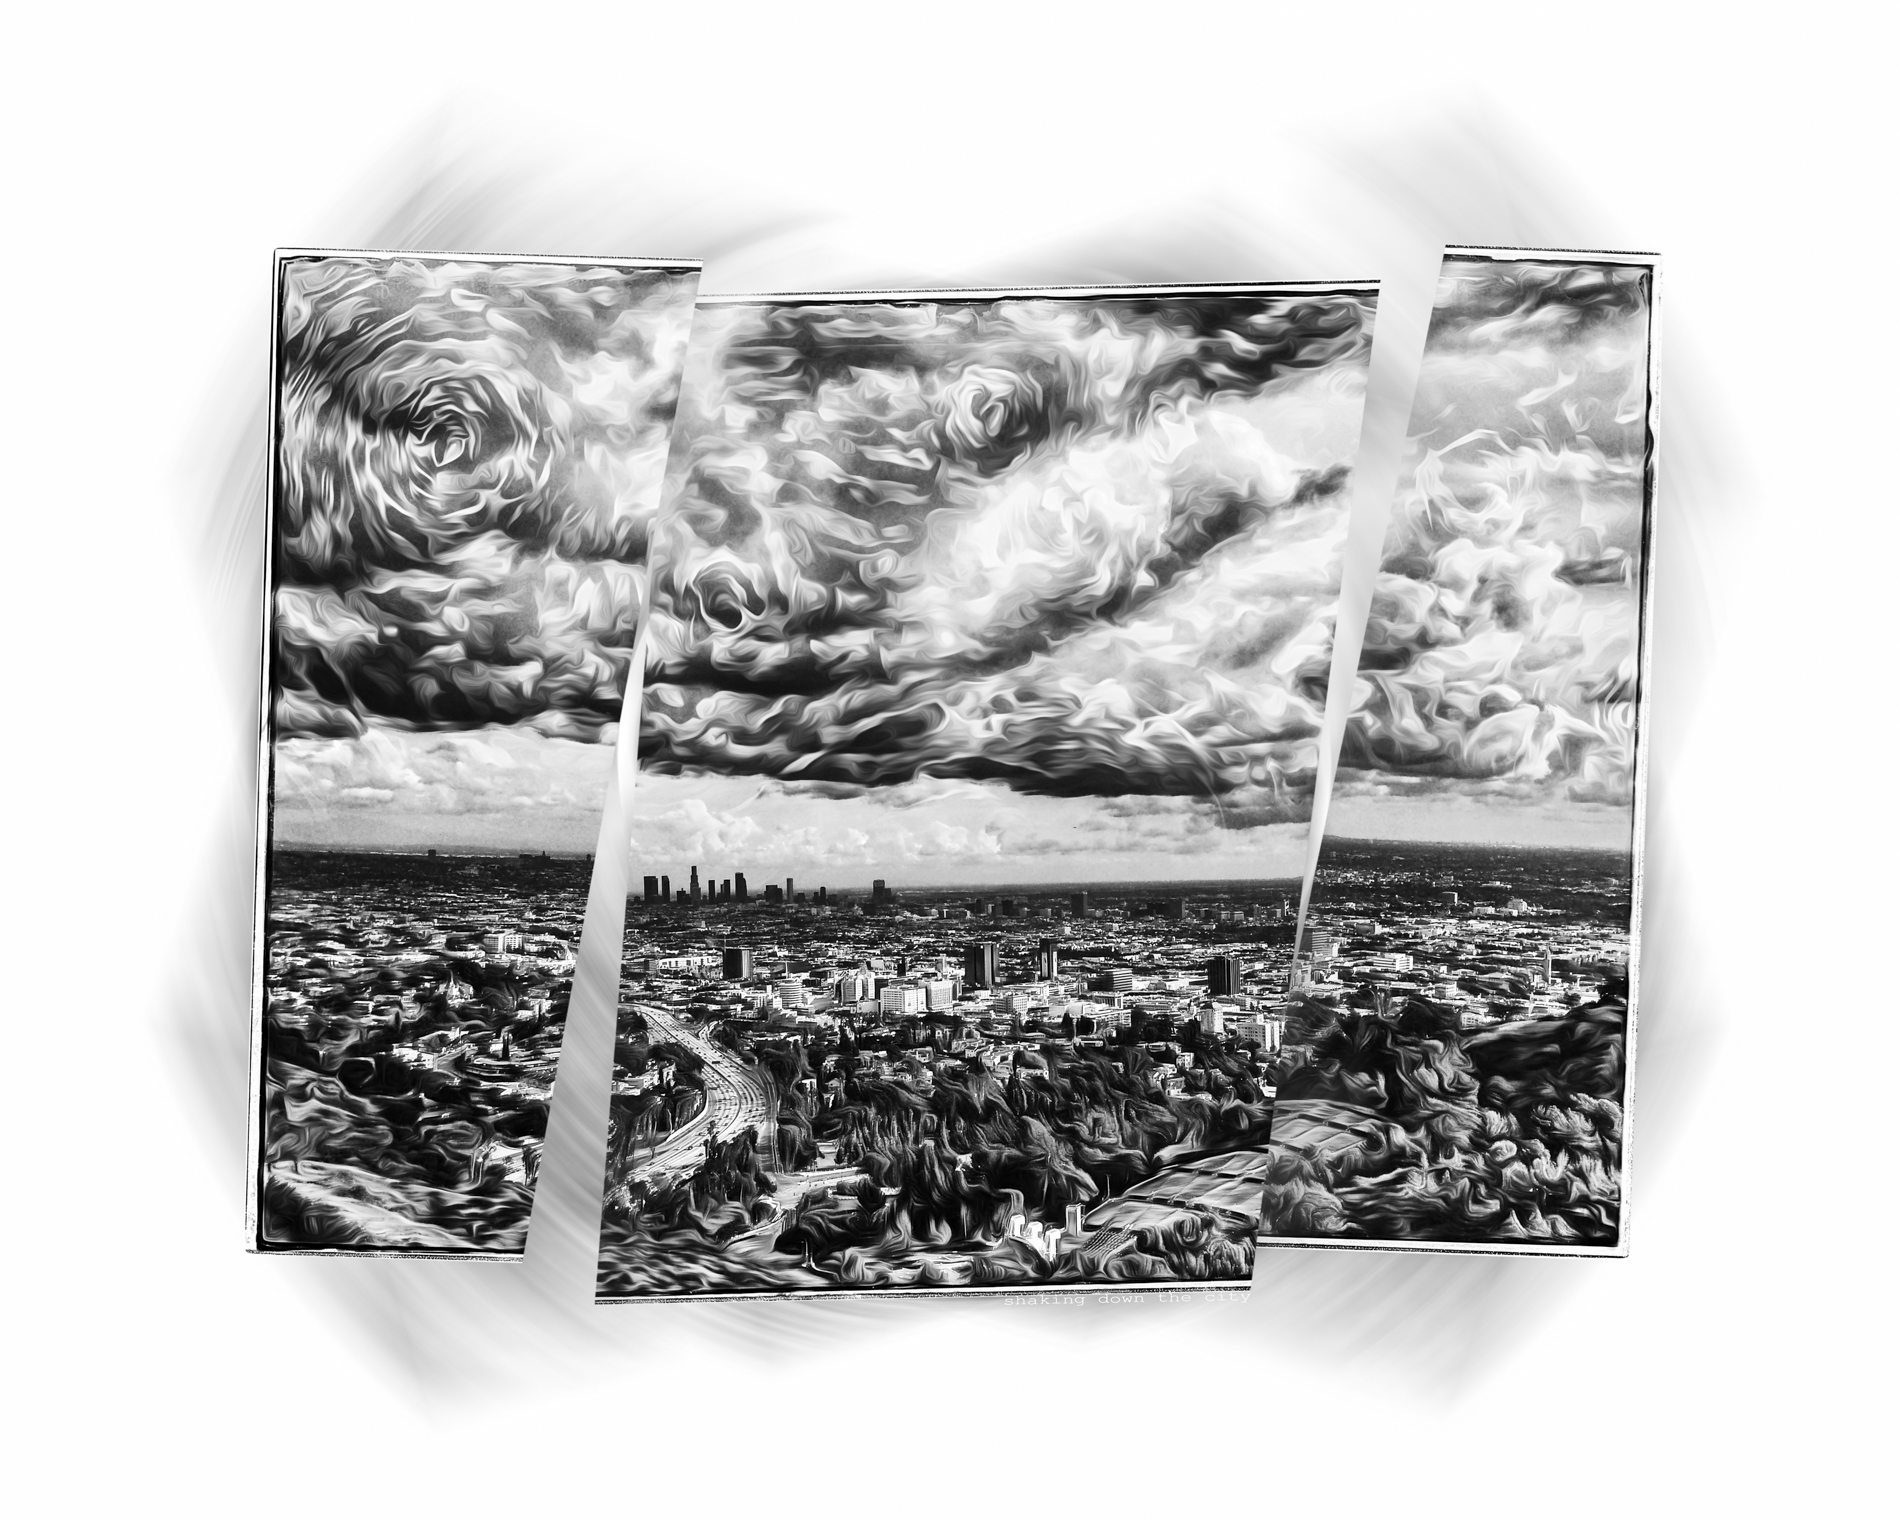 Shaking Down the CityBruce Burr - 1900x7